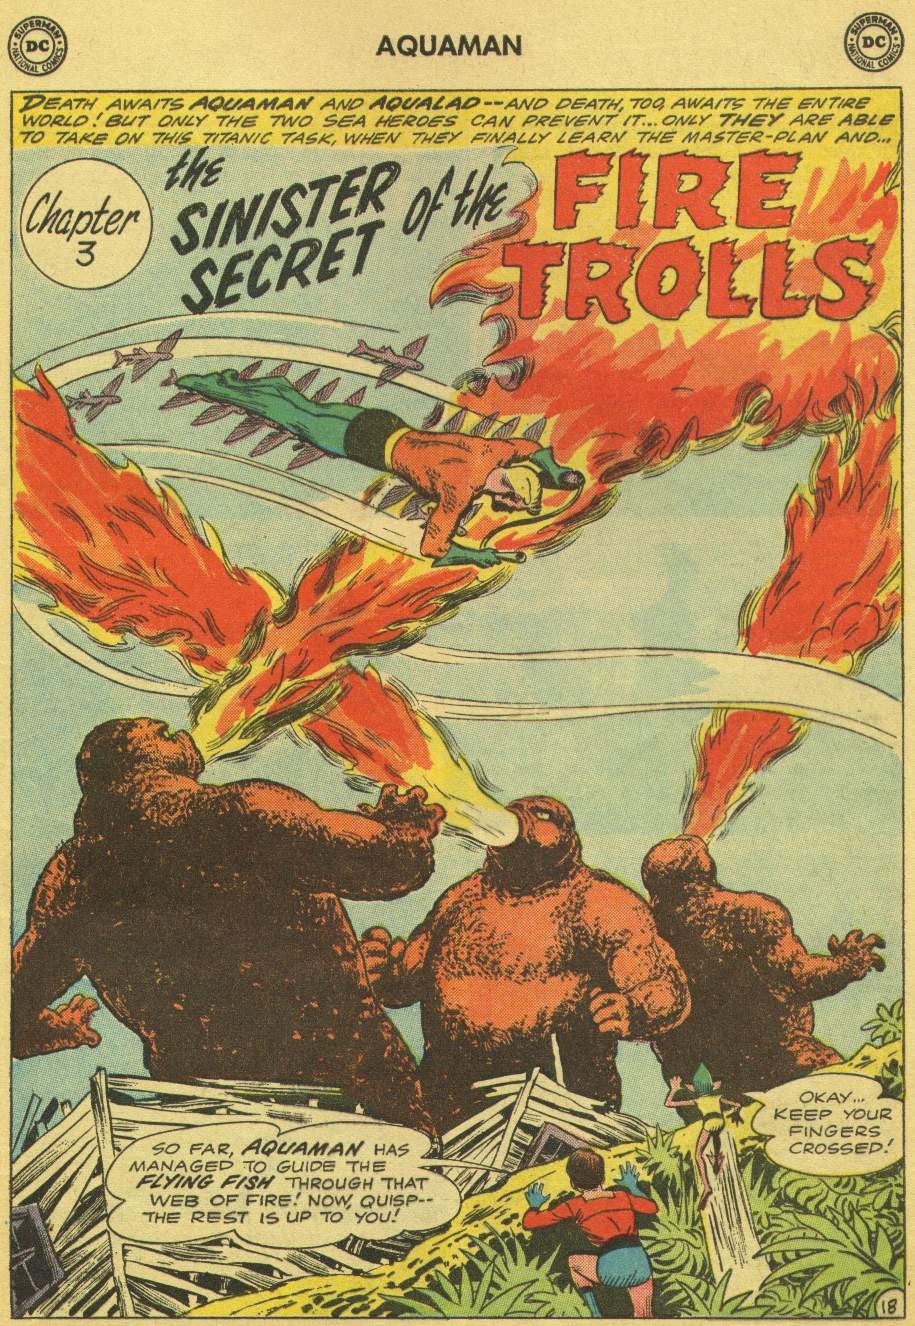 Read online Aquaman (1962) comic -  Issue #1 - 25